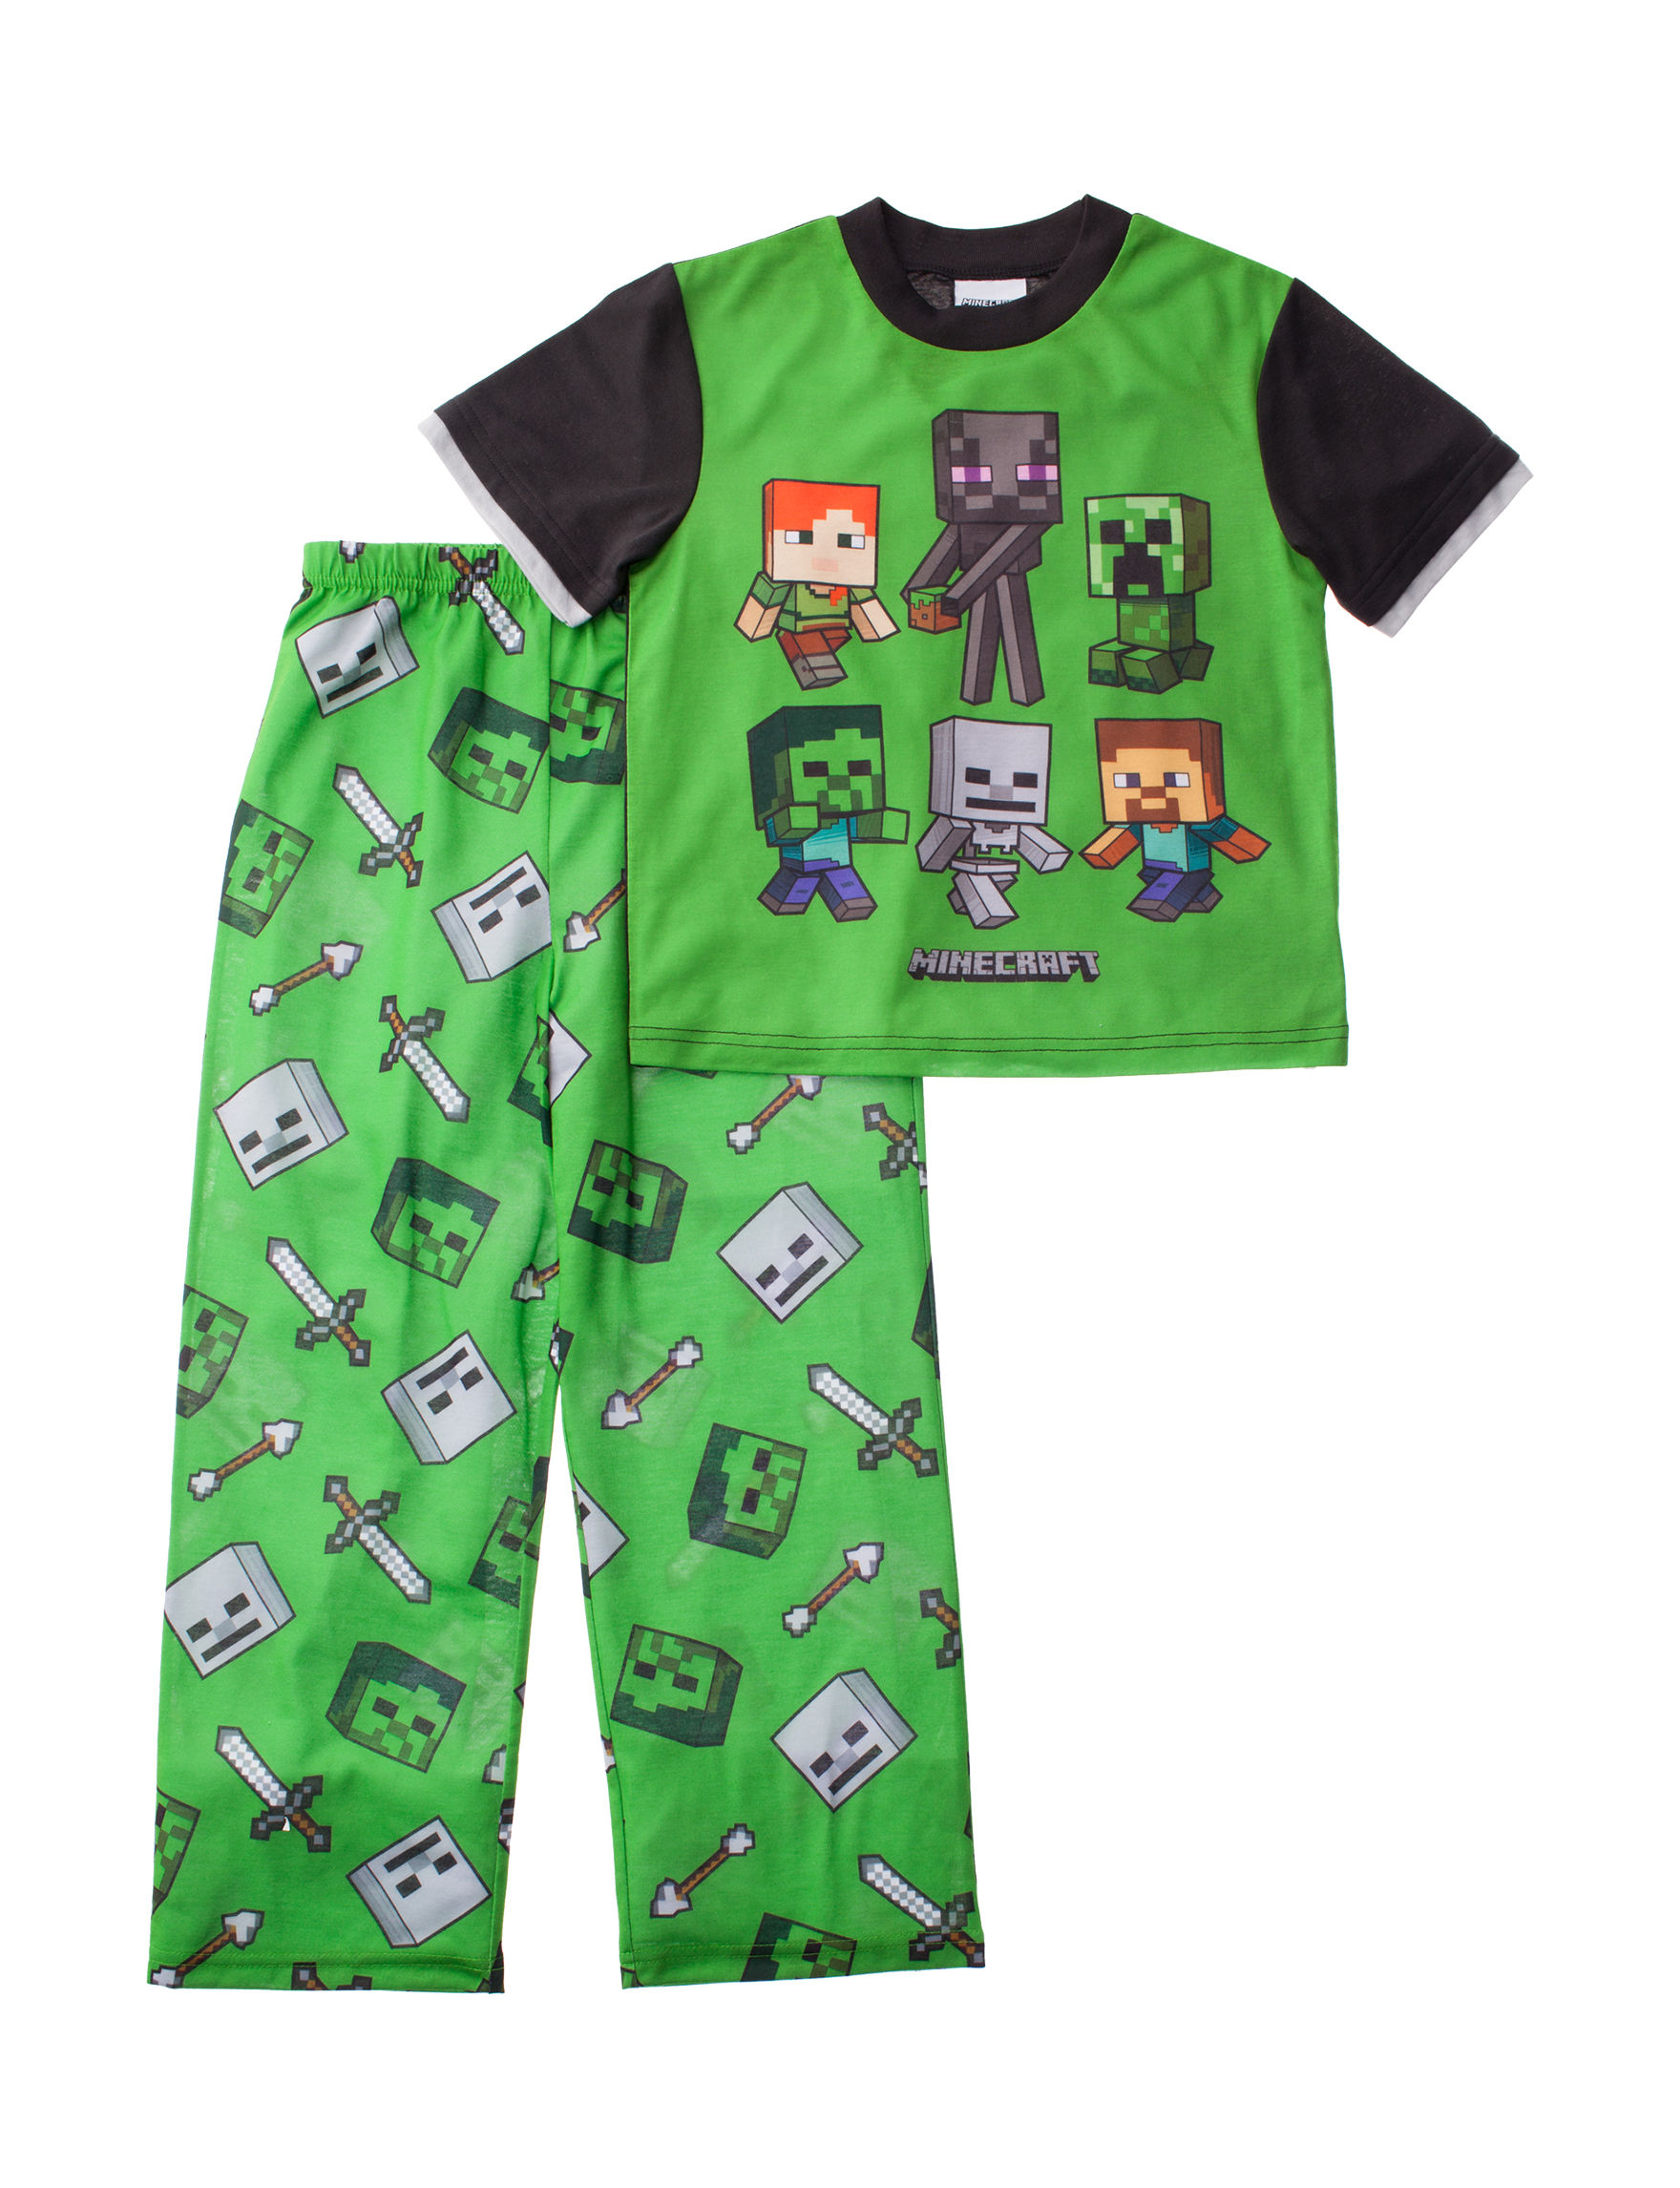 Licensed Green / Black Pajama Sets